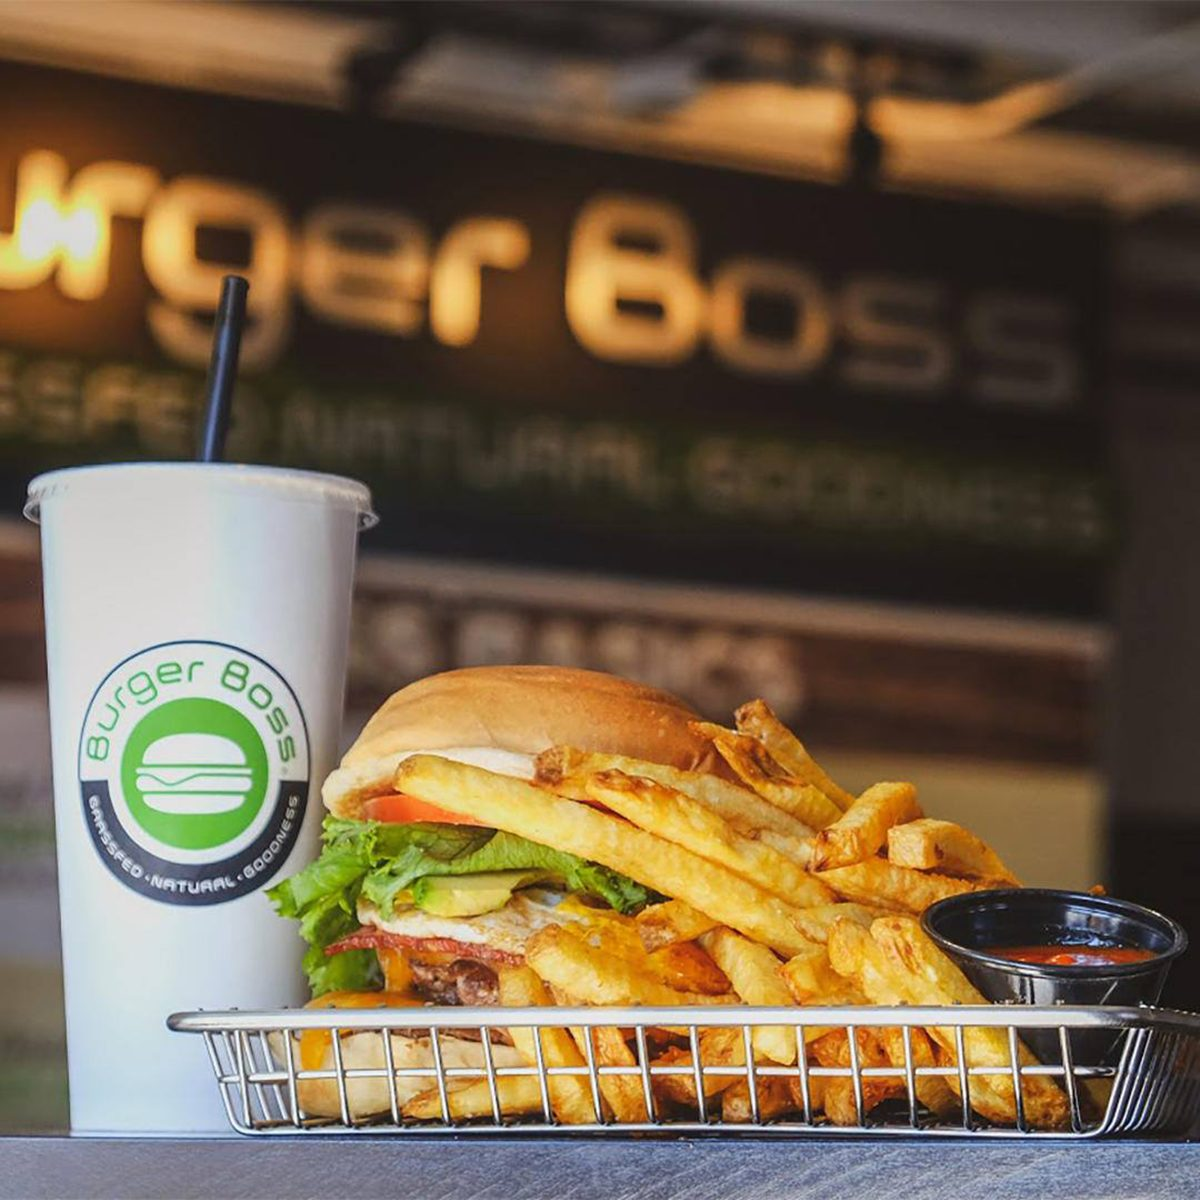 32oz drink + a side of fresh cut fries = Bossed Bundle